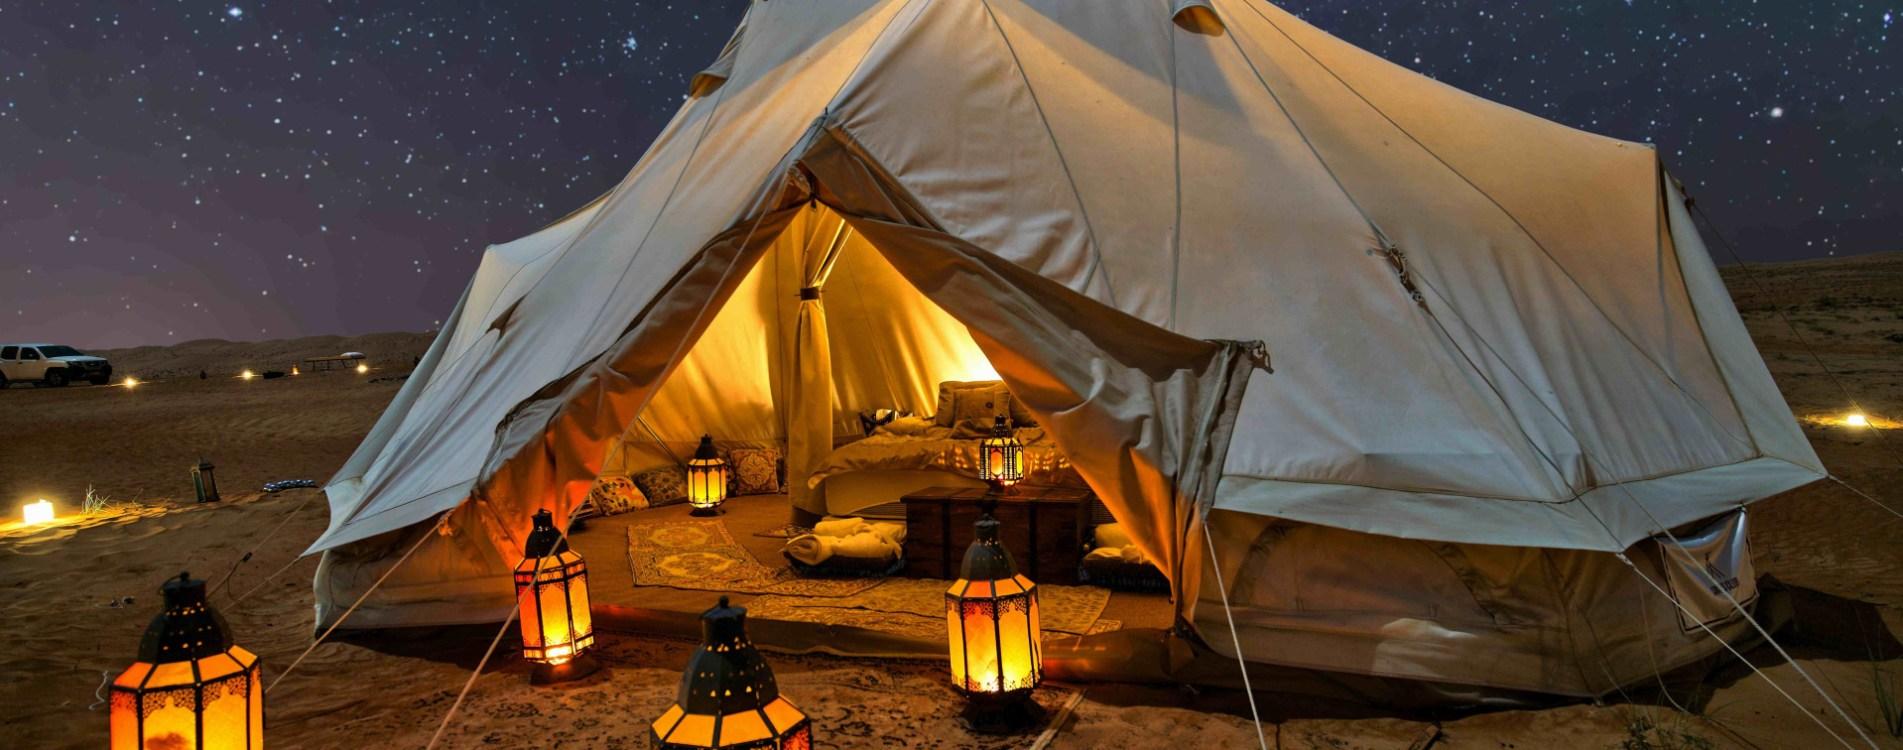 Canvas-Club-Zelt-Wahiba-Wüste-Oman.jpg